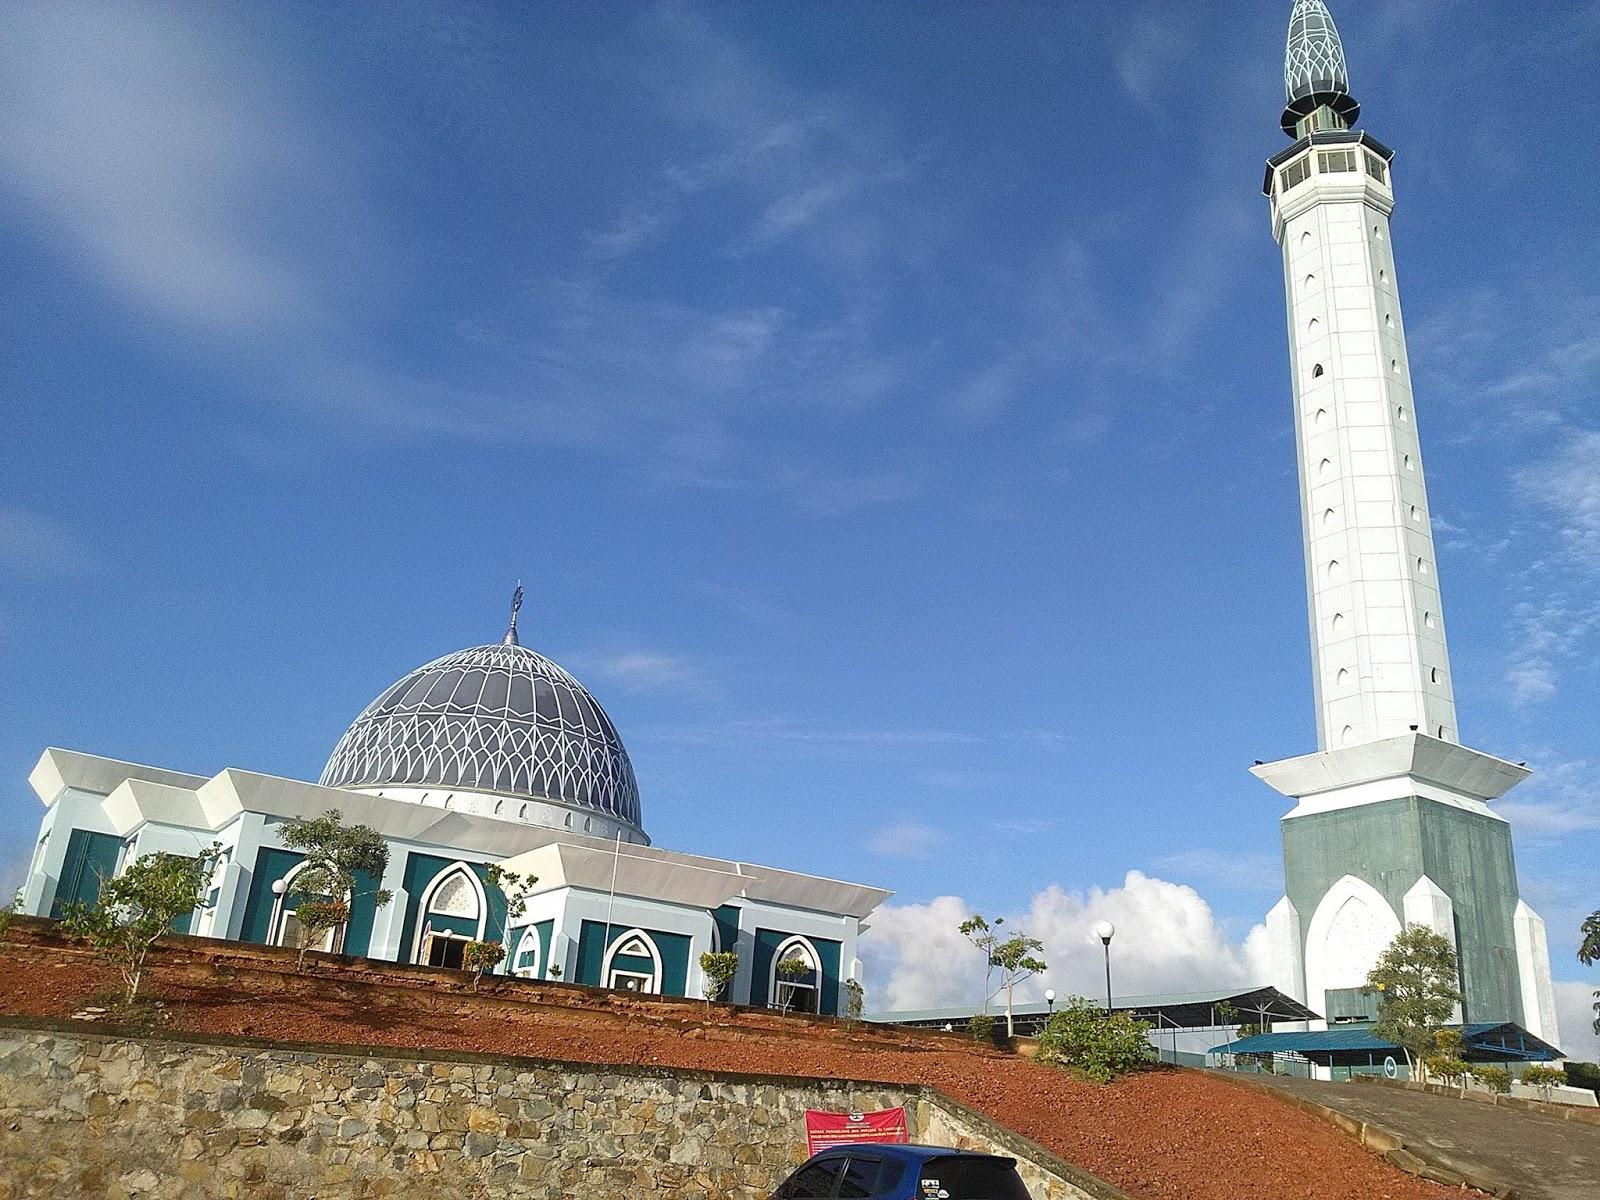 Hidup Inspirasi Nur Ilahi Masjid Anggun Atas Lautan Raya Dompak